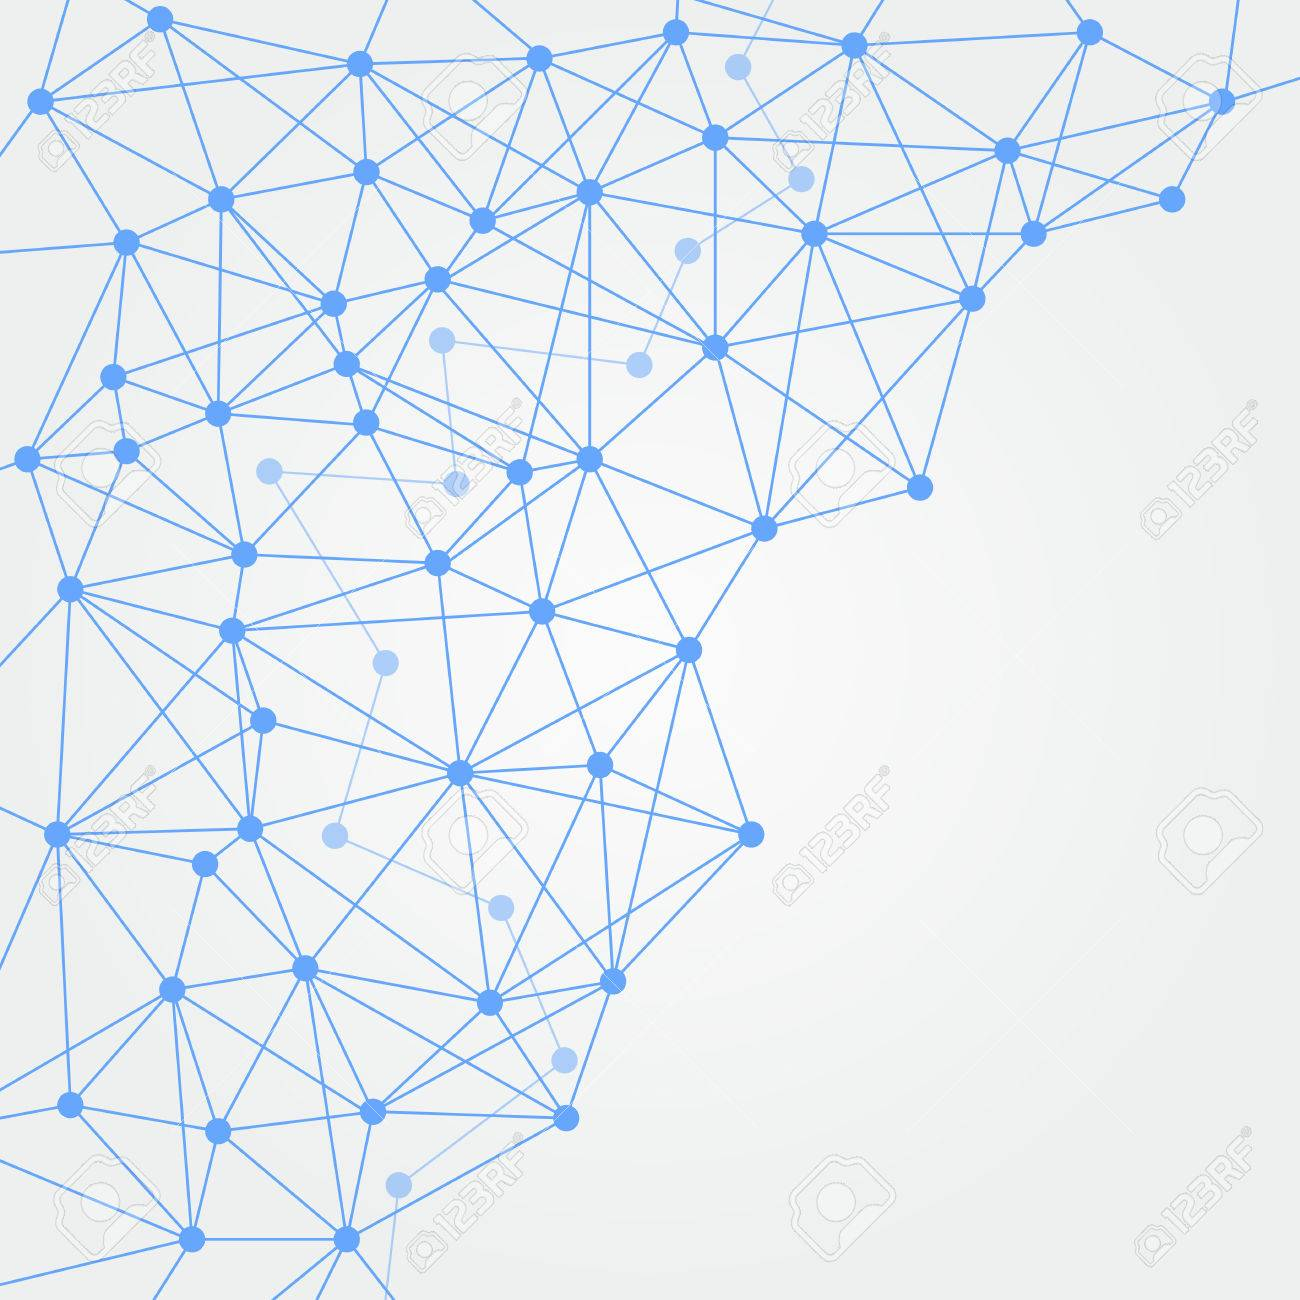 light blue networking crossing elegant modern web on gray background